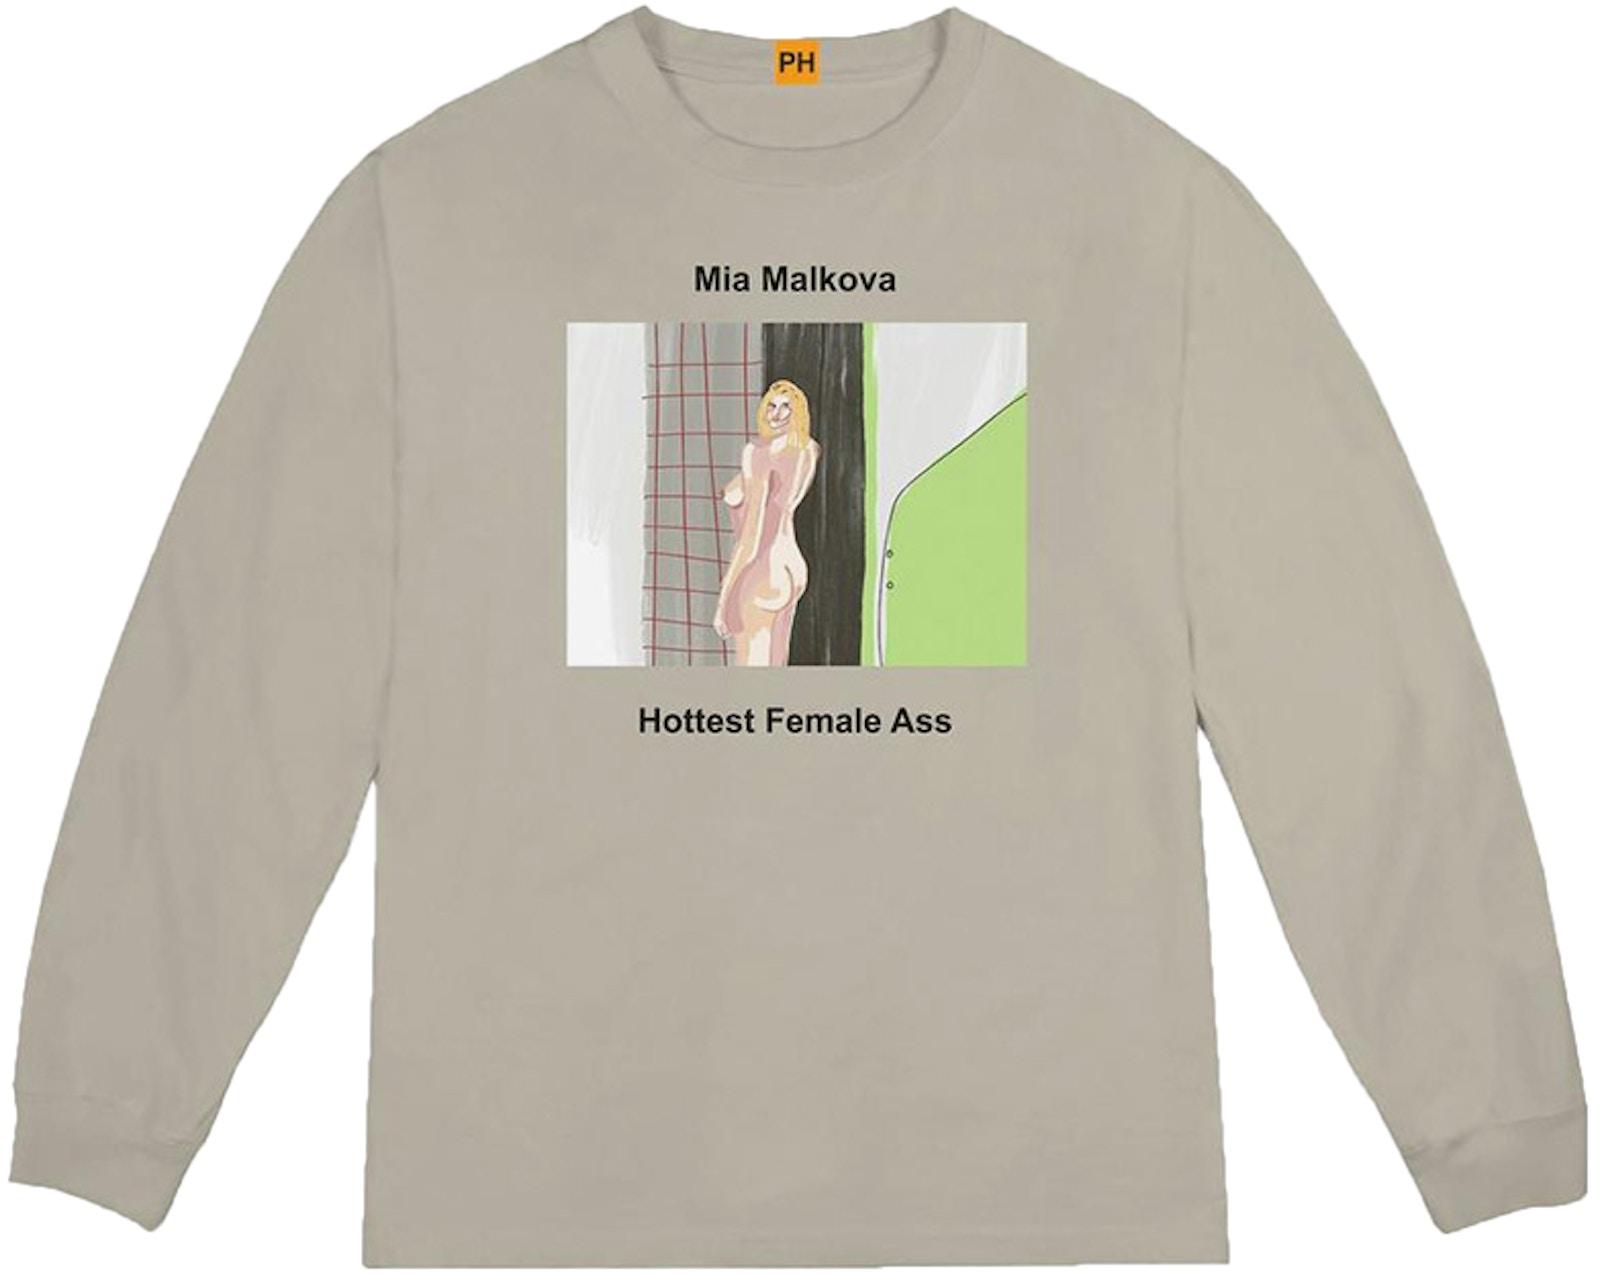 Kanye West Pornhub Mia Malkova L/S Tee Vapor - FW18